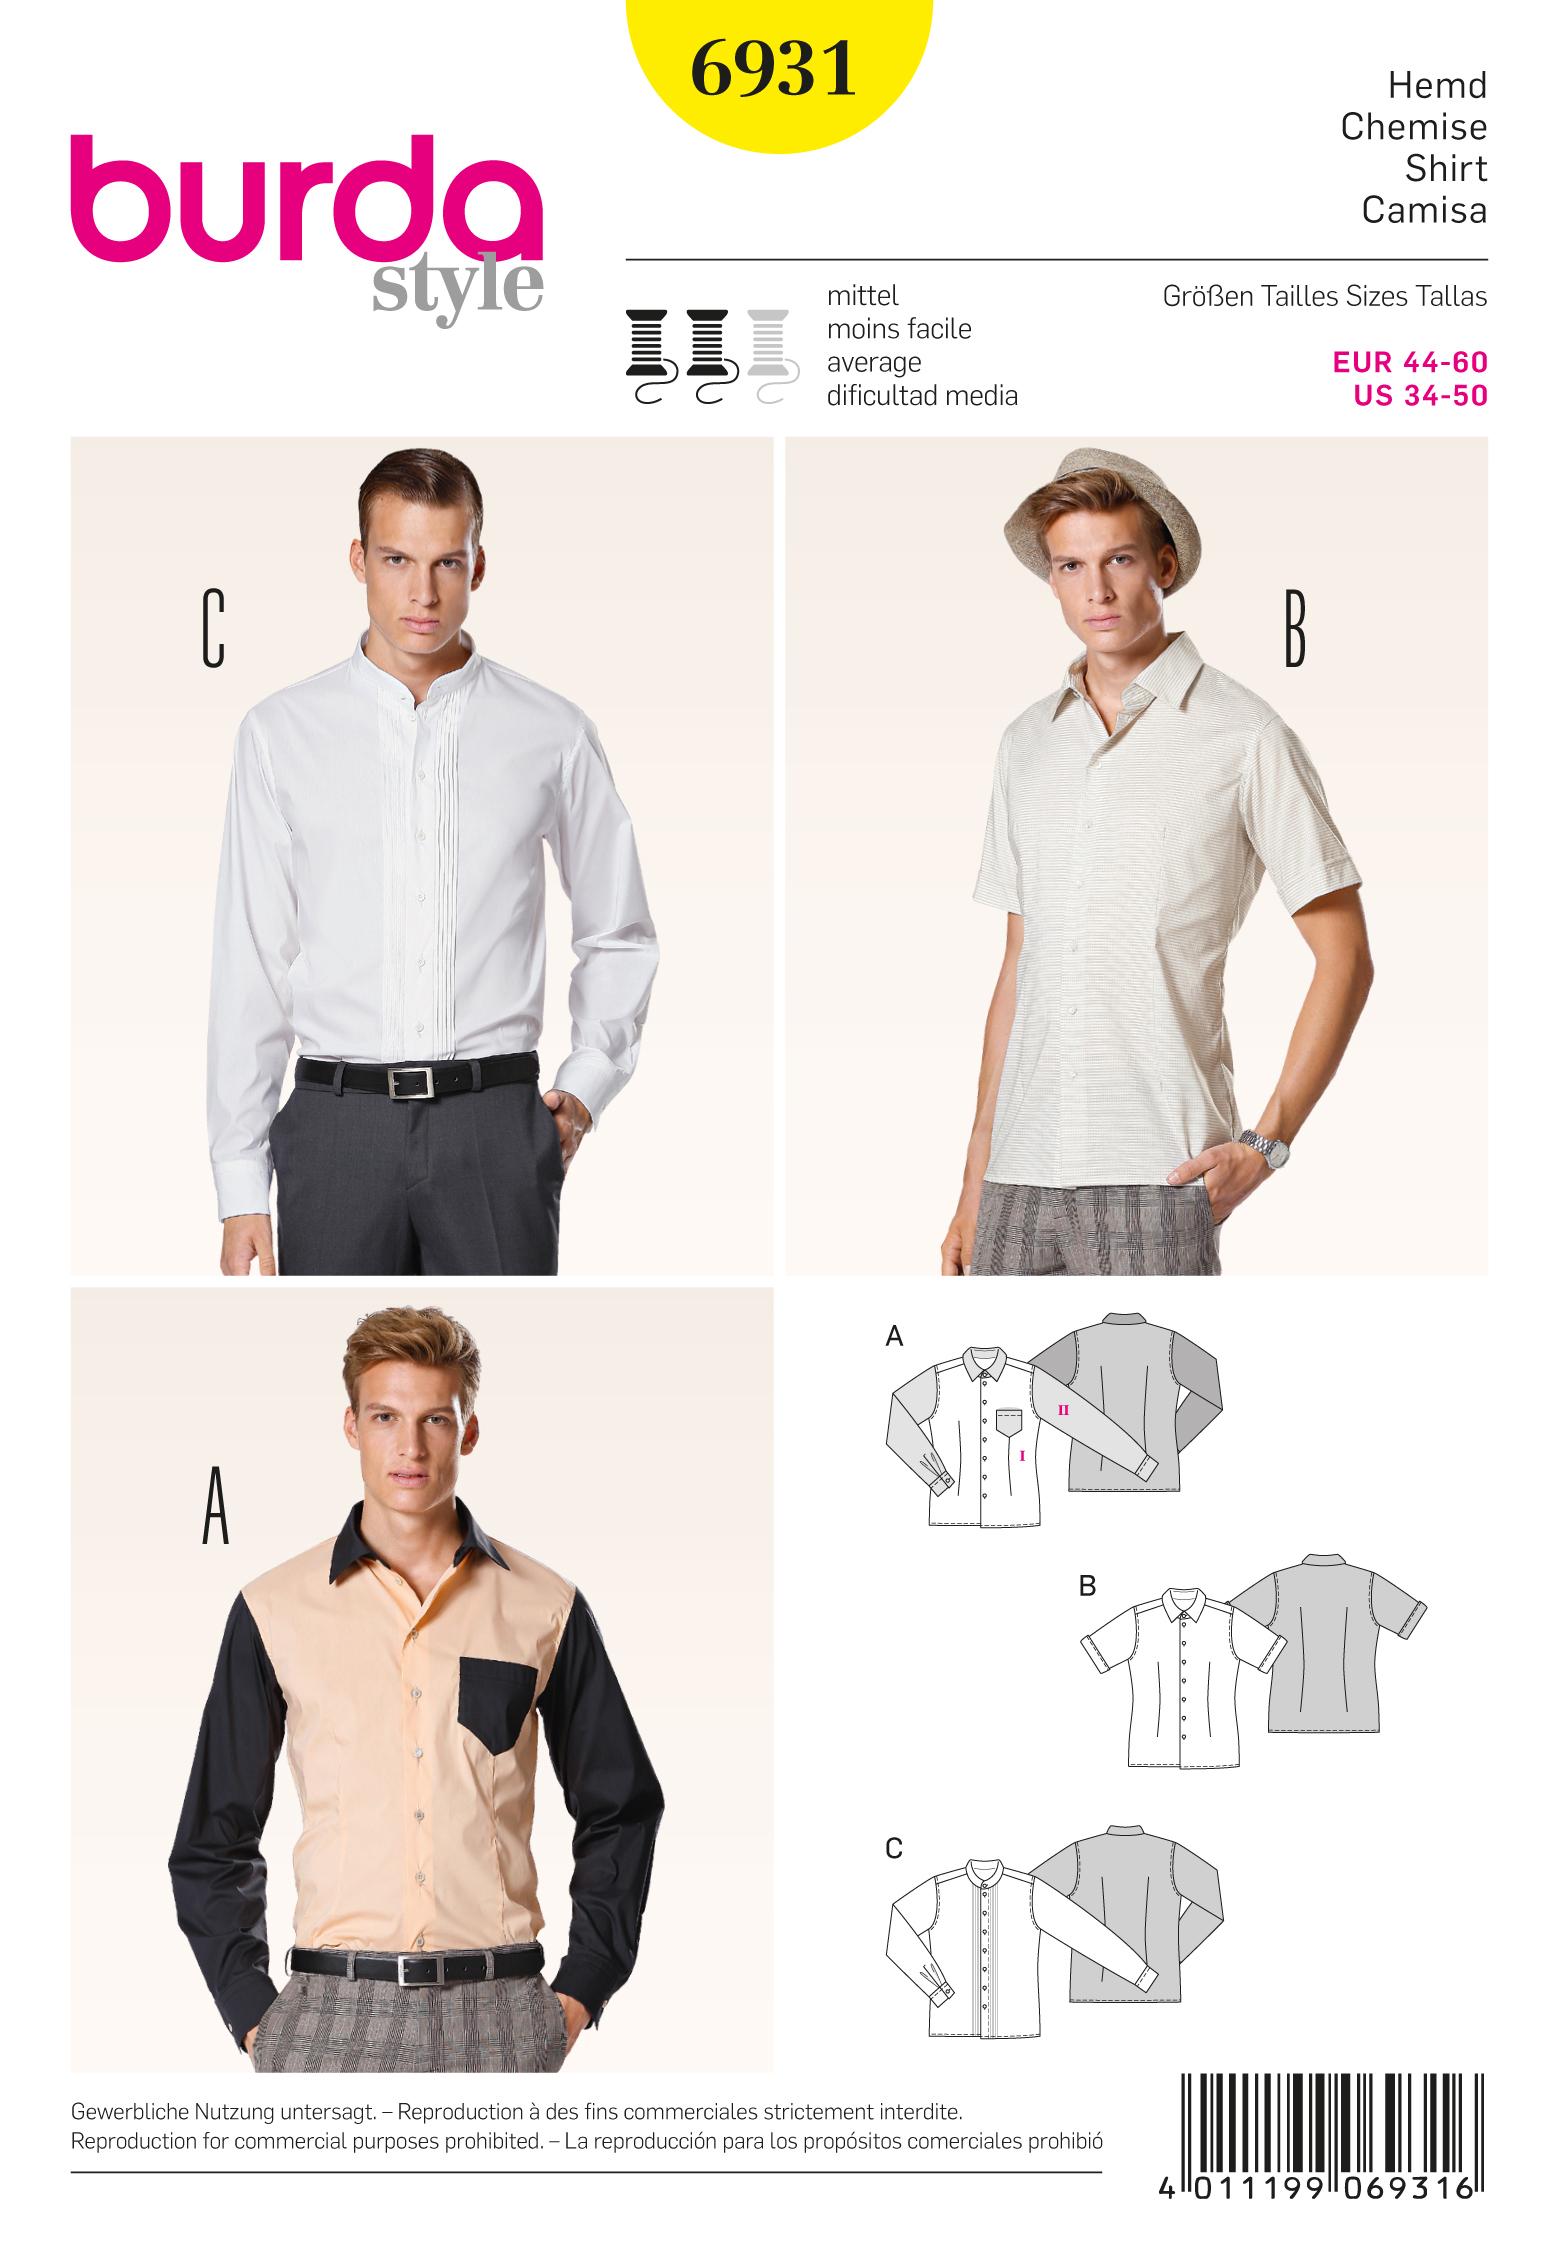 Burda Menswear 6931